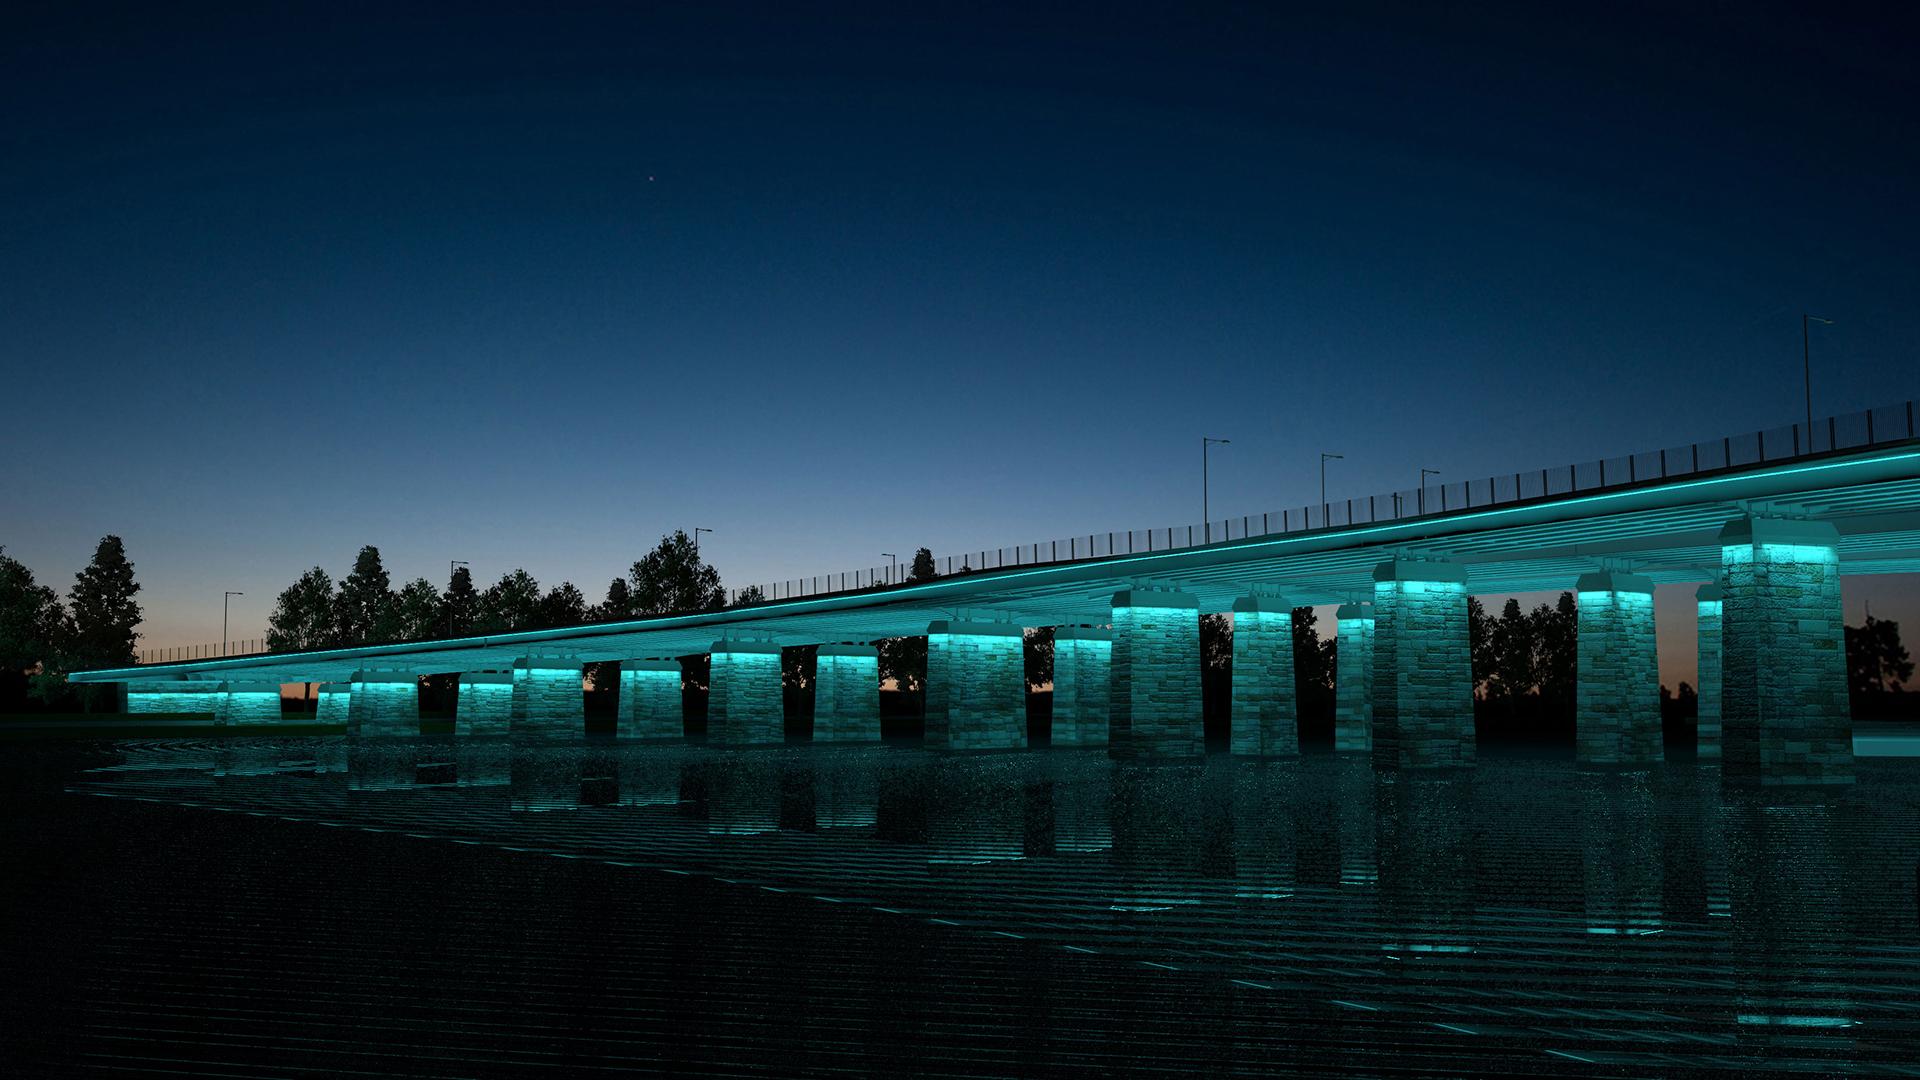 Francis Case Memorial Bridge